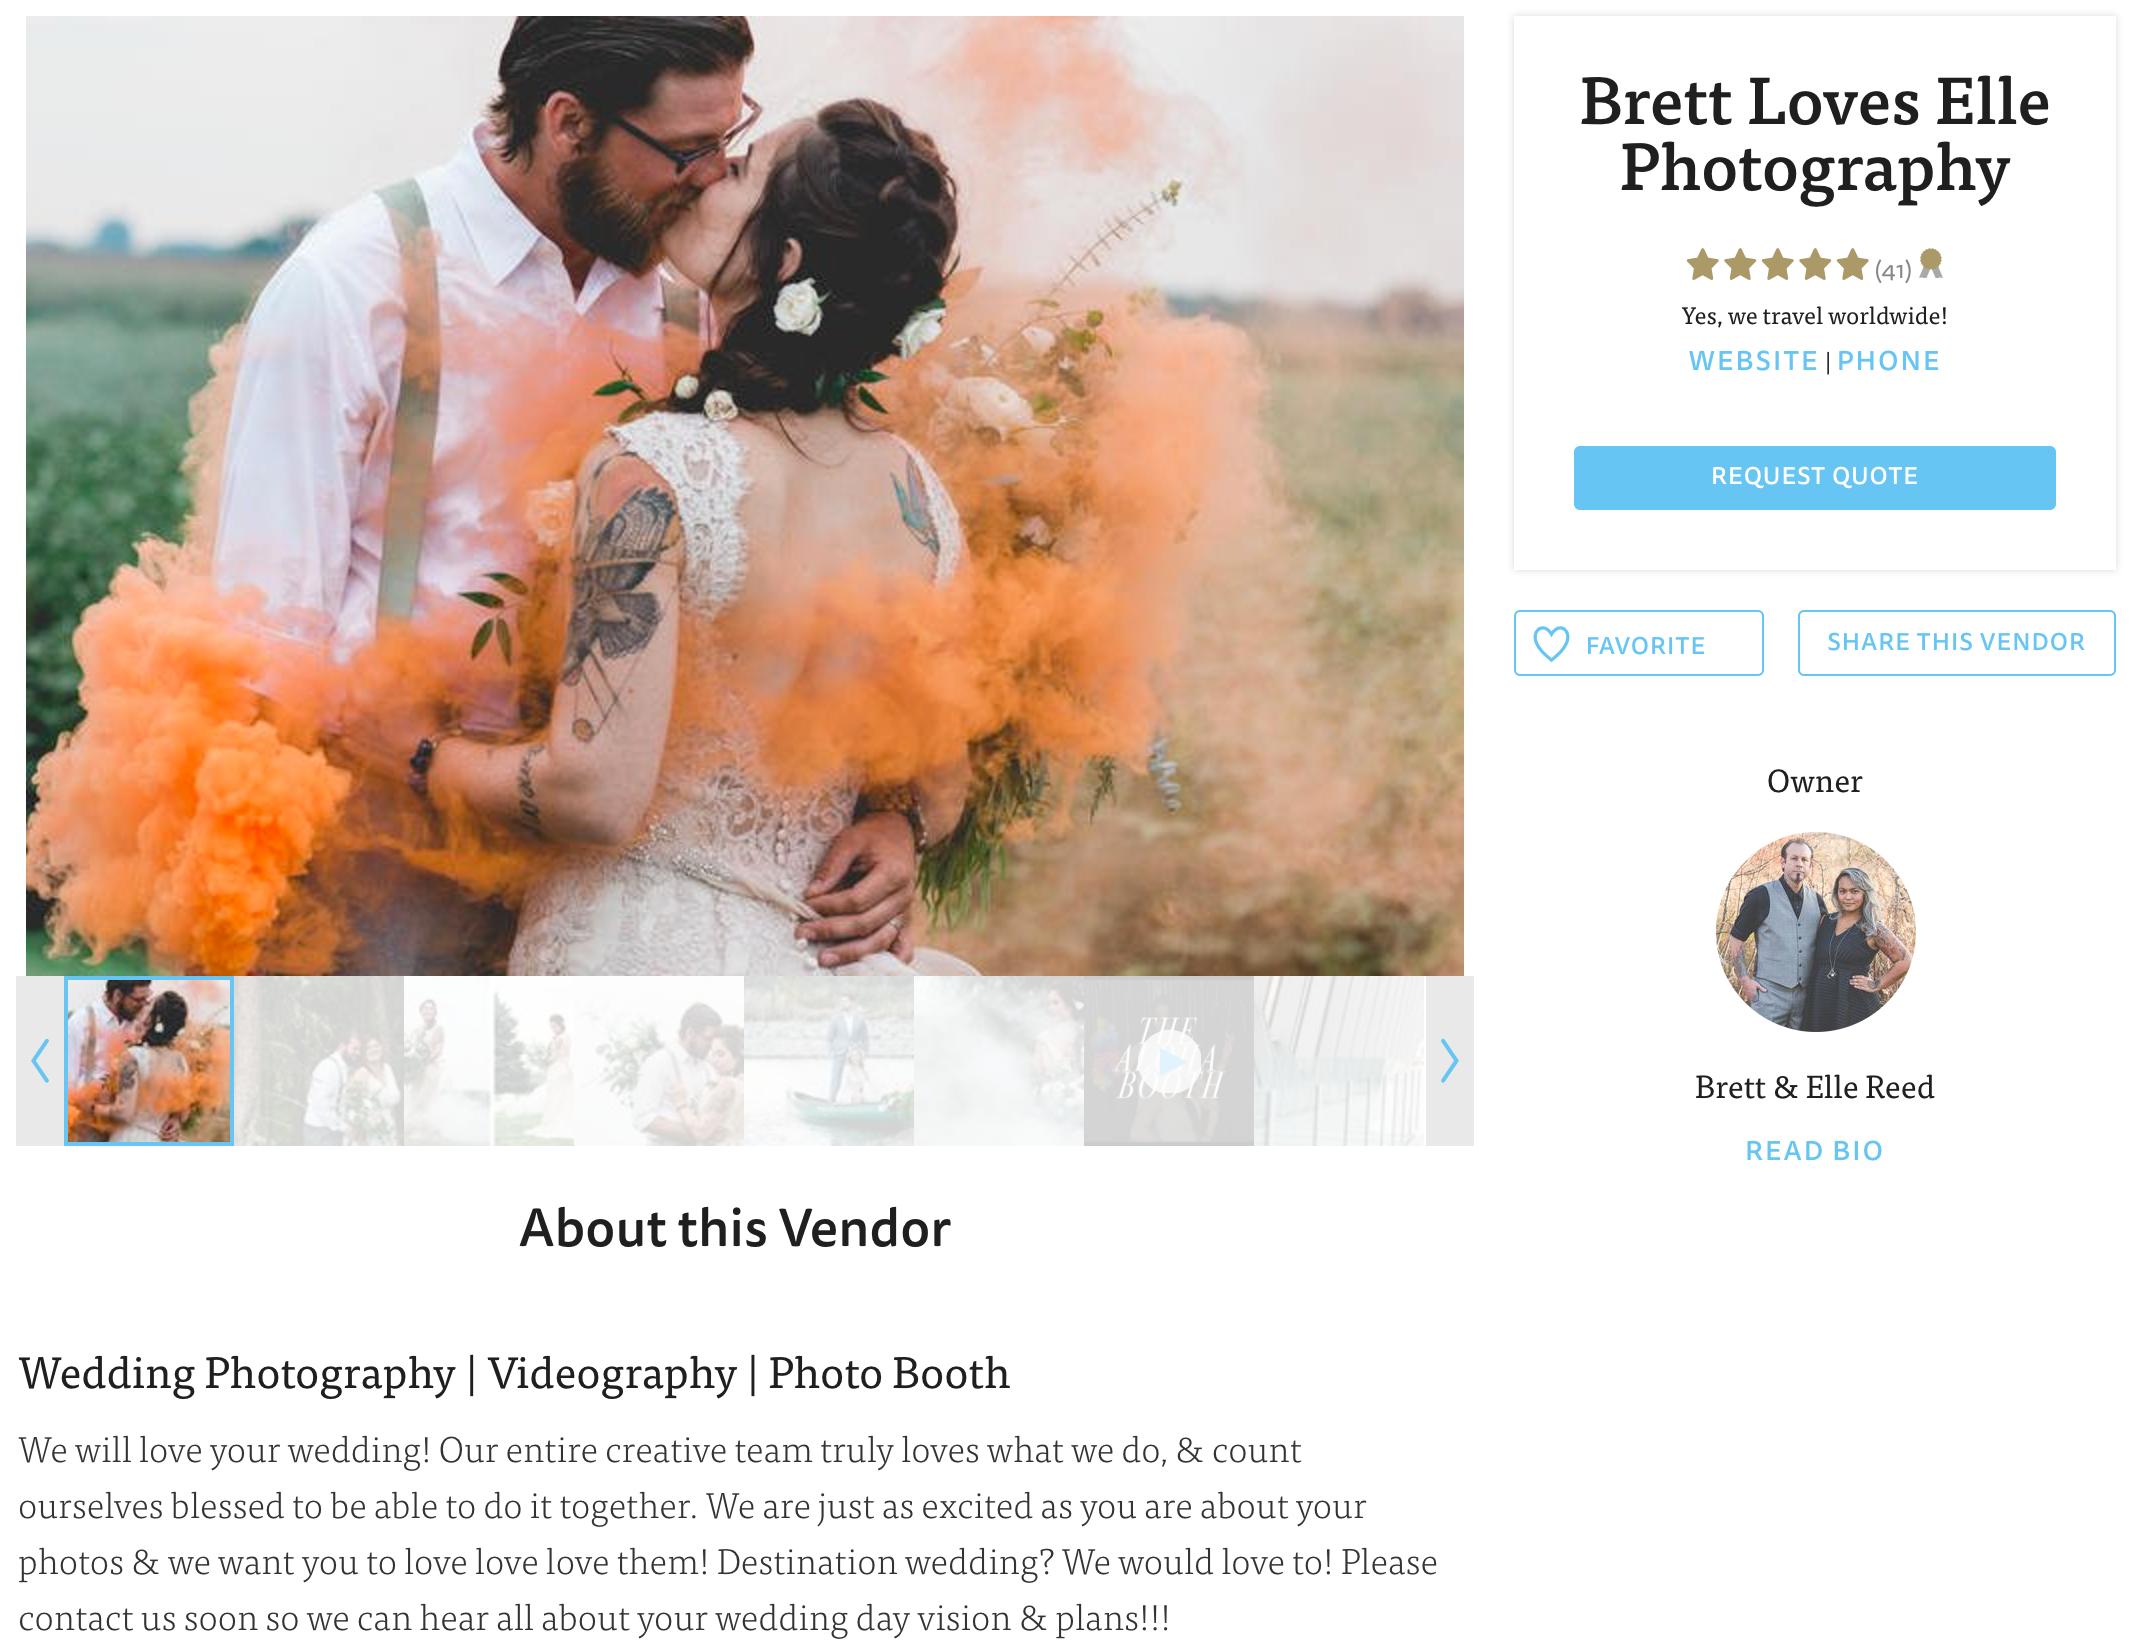 Brett Loves Elle Photography, The Knot Best of Weddings 2017, Columbus Wedding Photographers